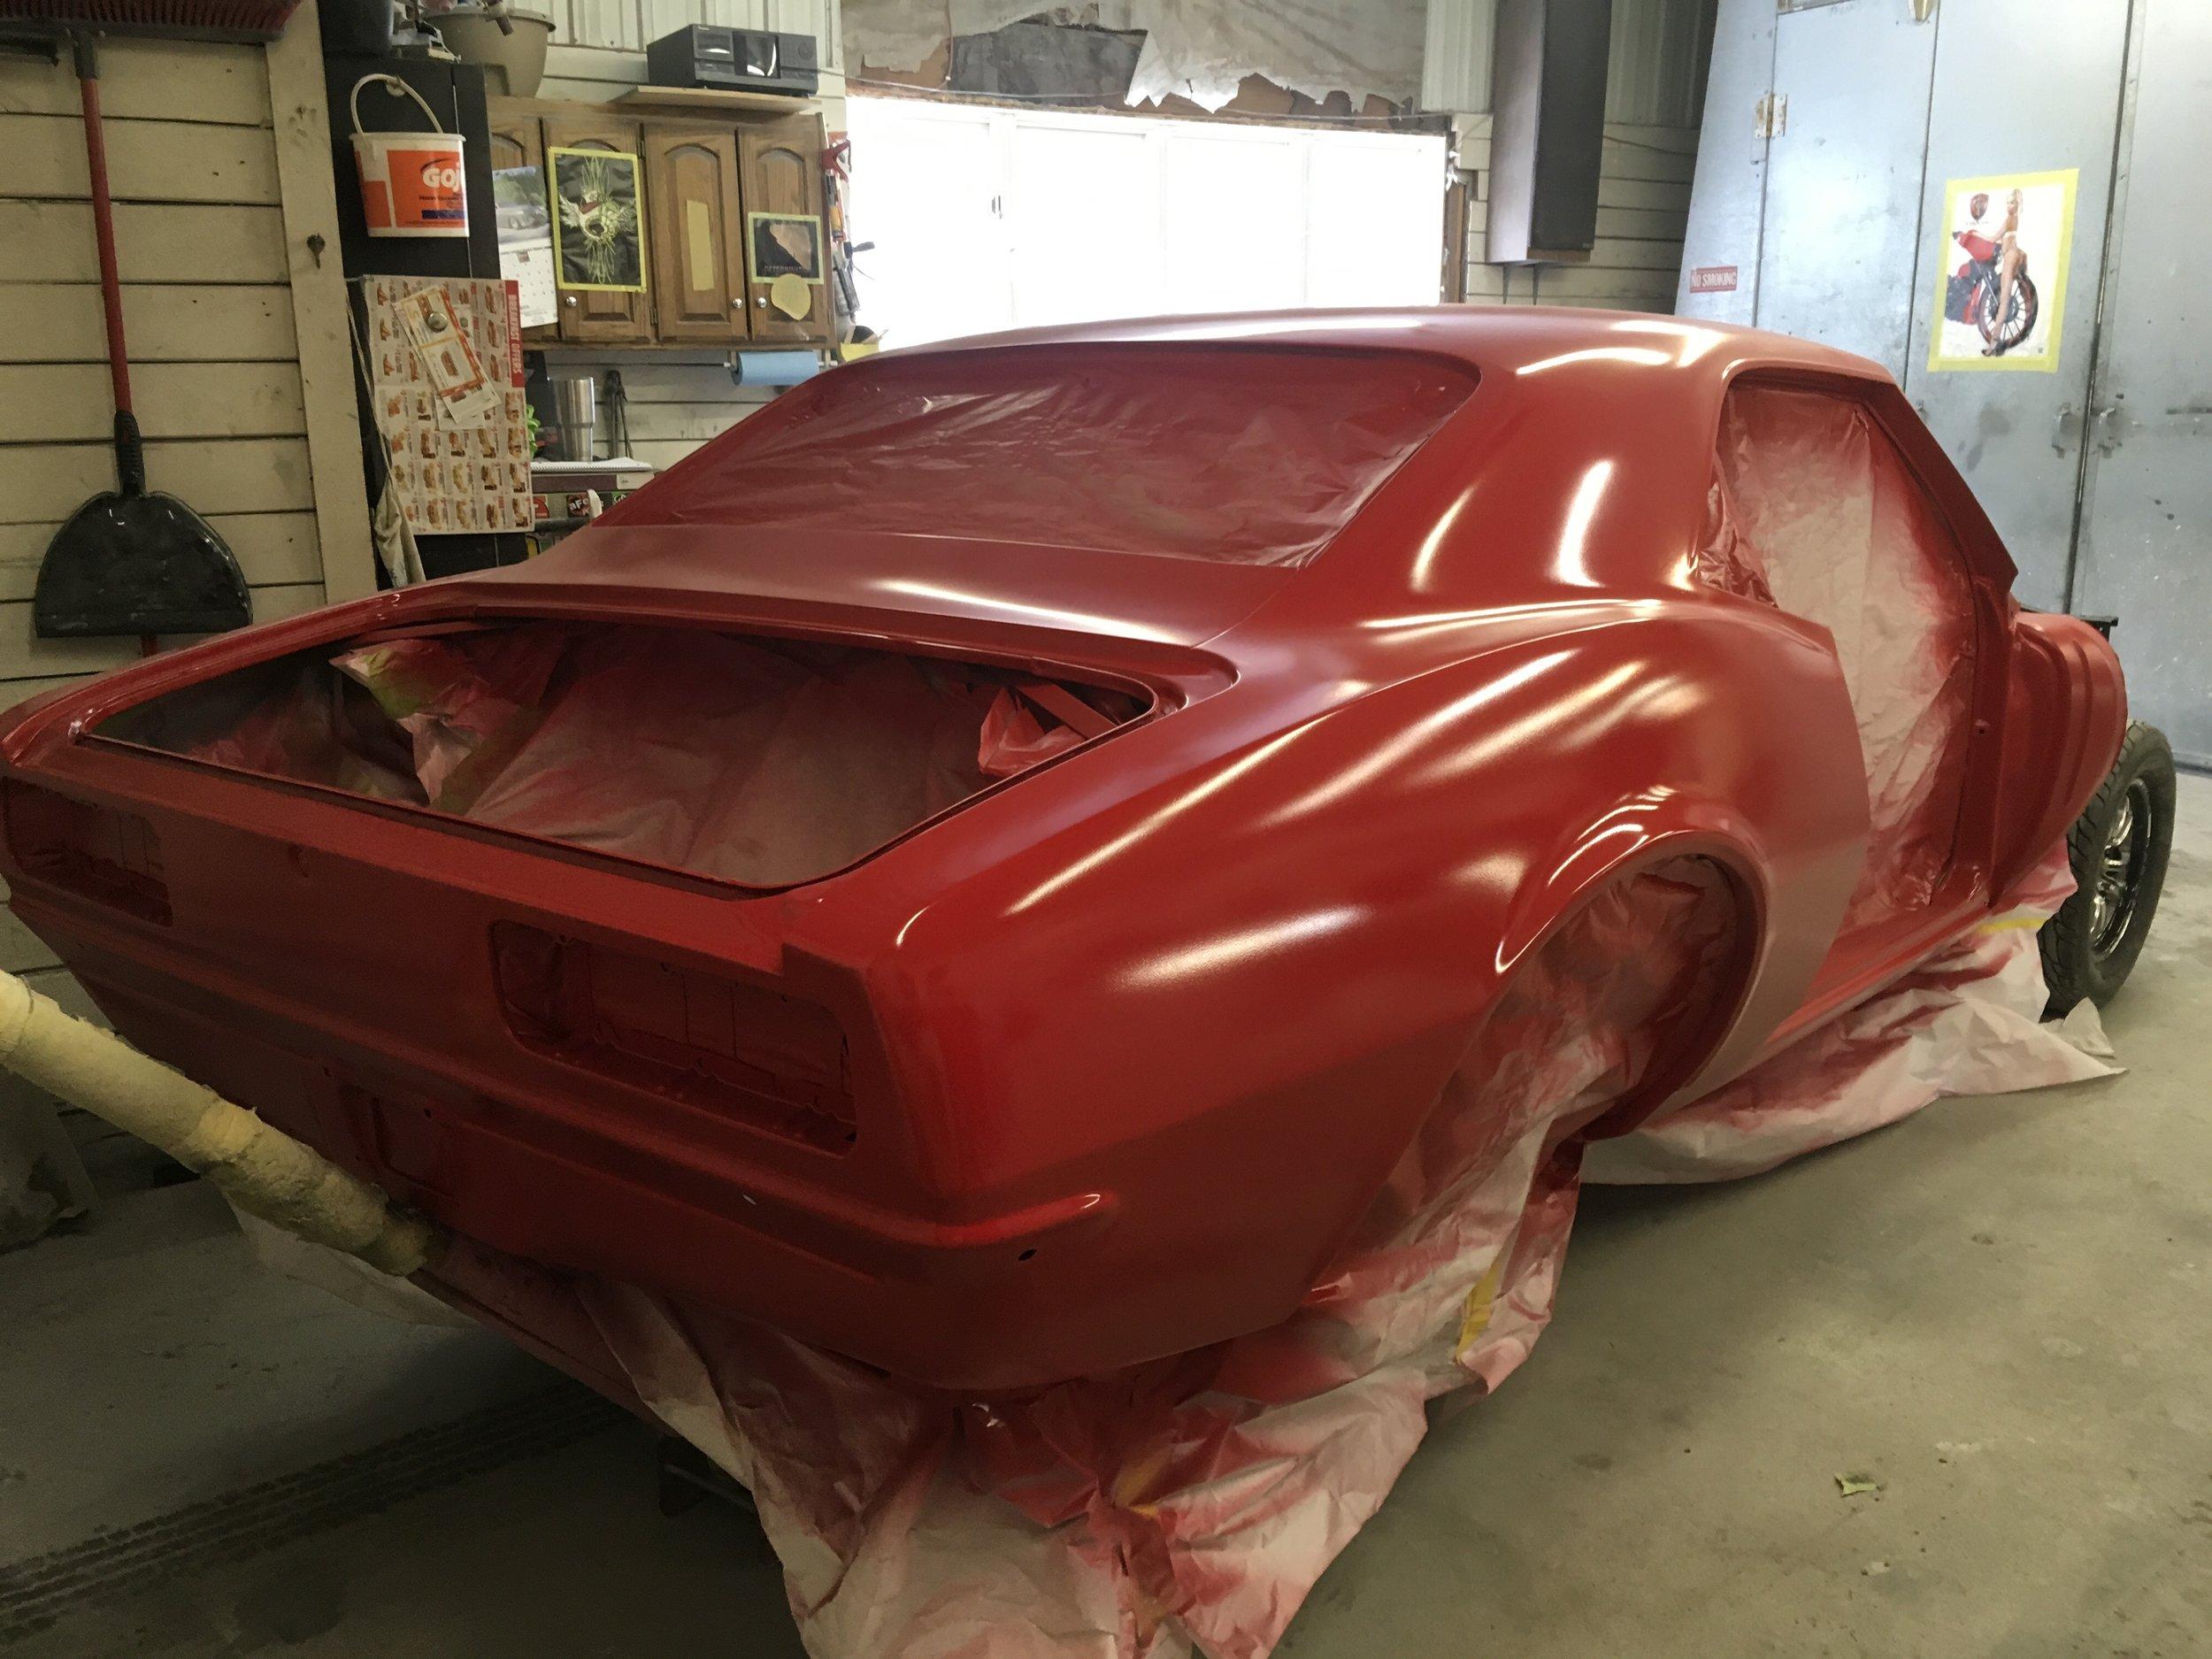 1967-camaro-minneapolis-custom-hot-rod-car-restoration-painting-hot-rod-factory.jpg